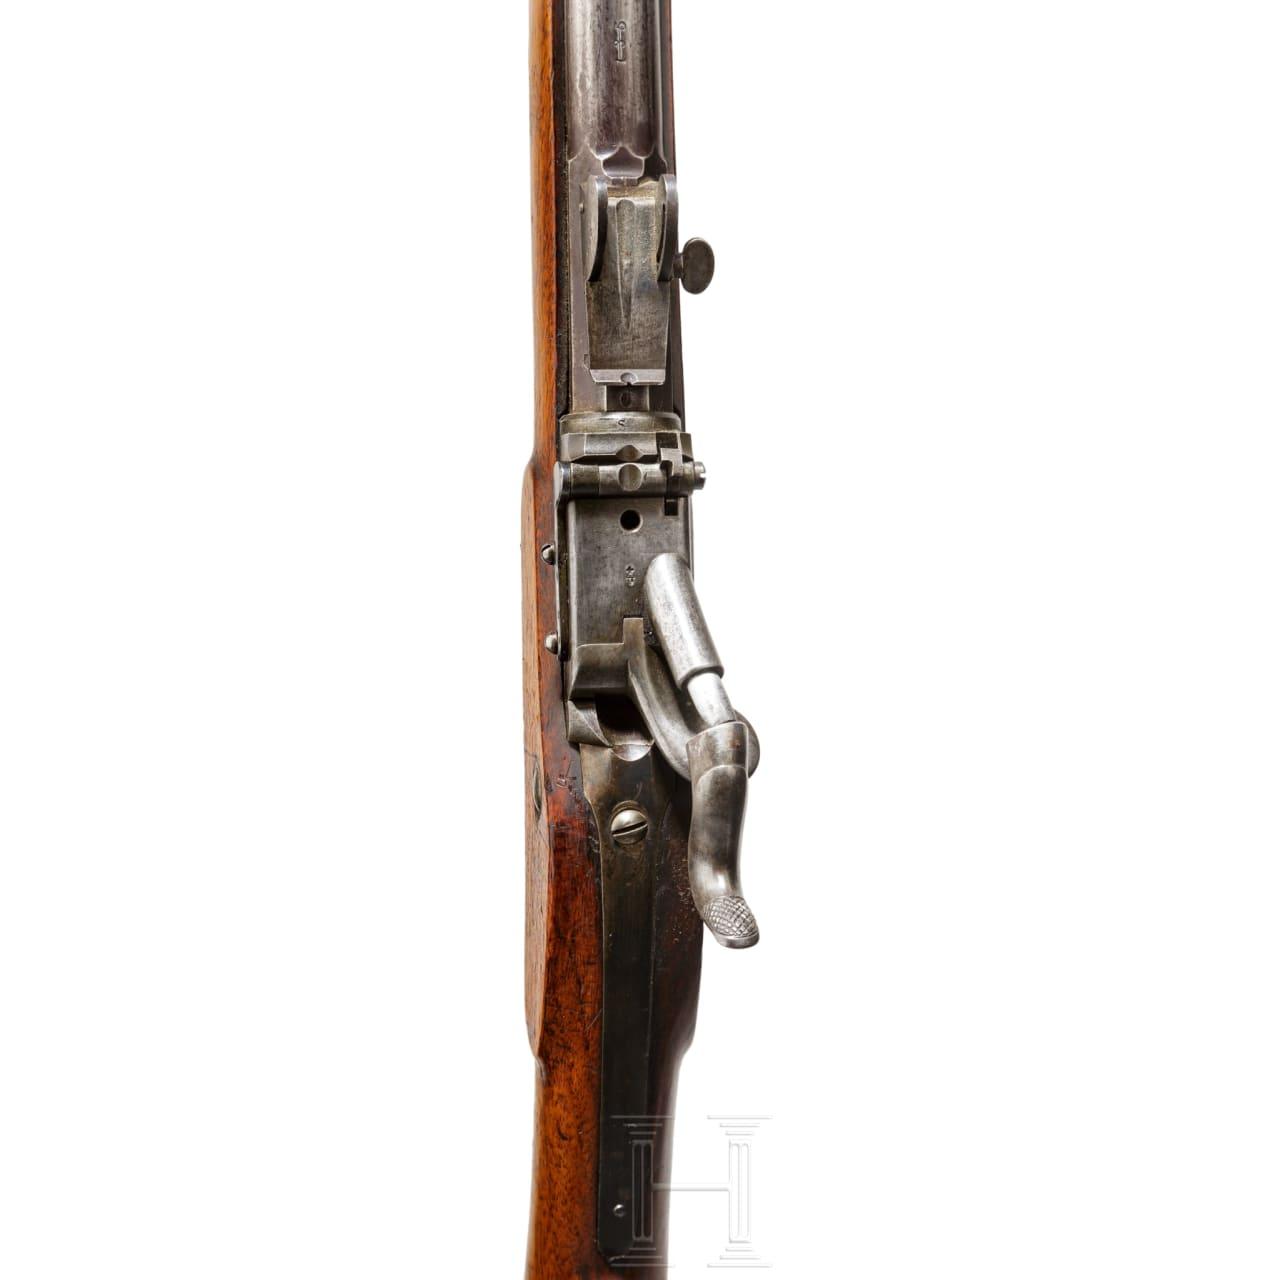 Jägerstutzen Milbank-Amsler, M 1851/67, mit Bajonett